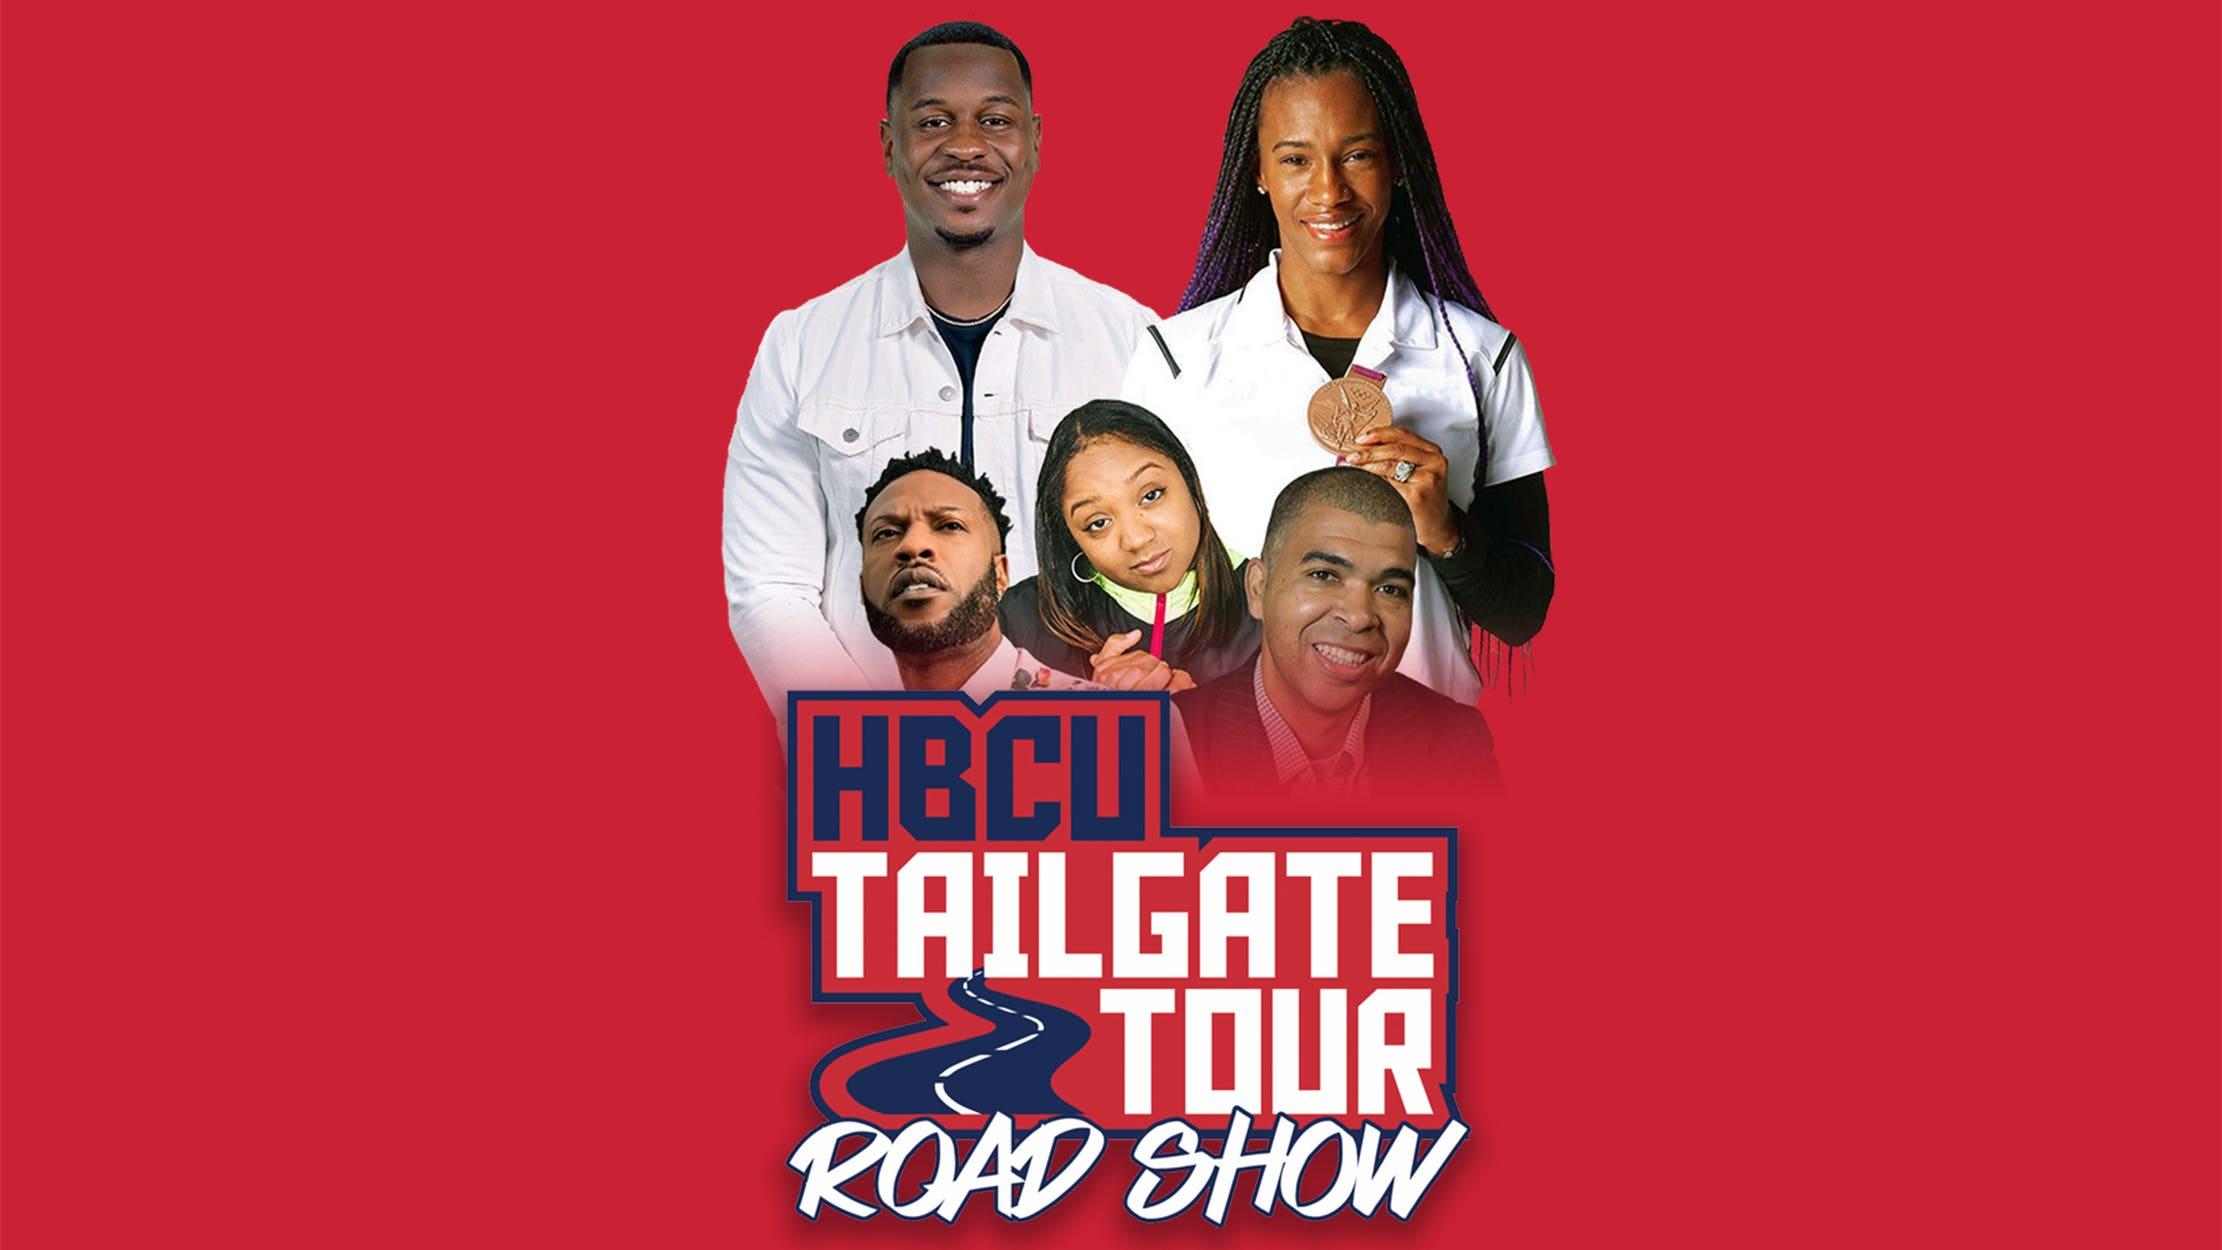 HBCU Tailgate Tour seriesDetail